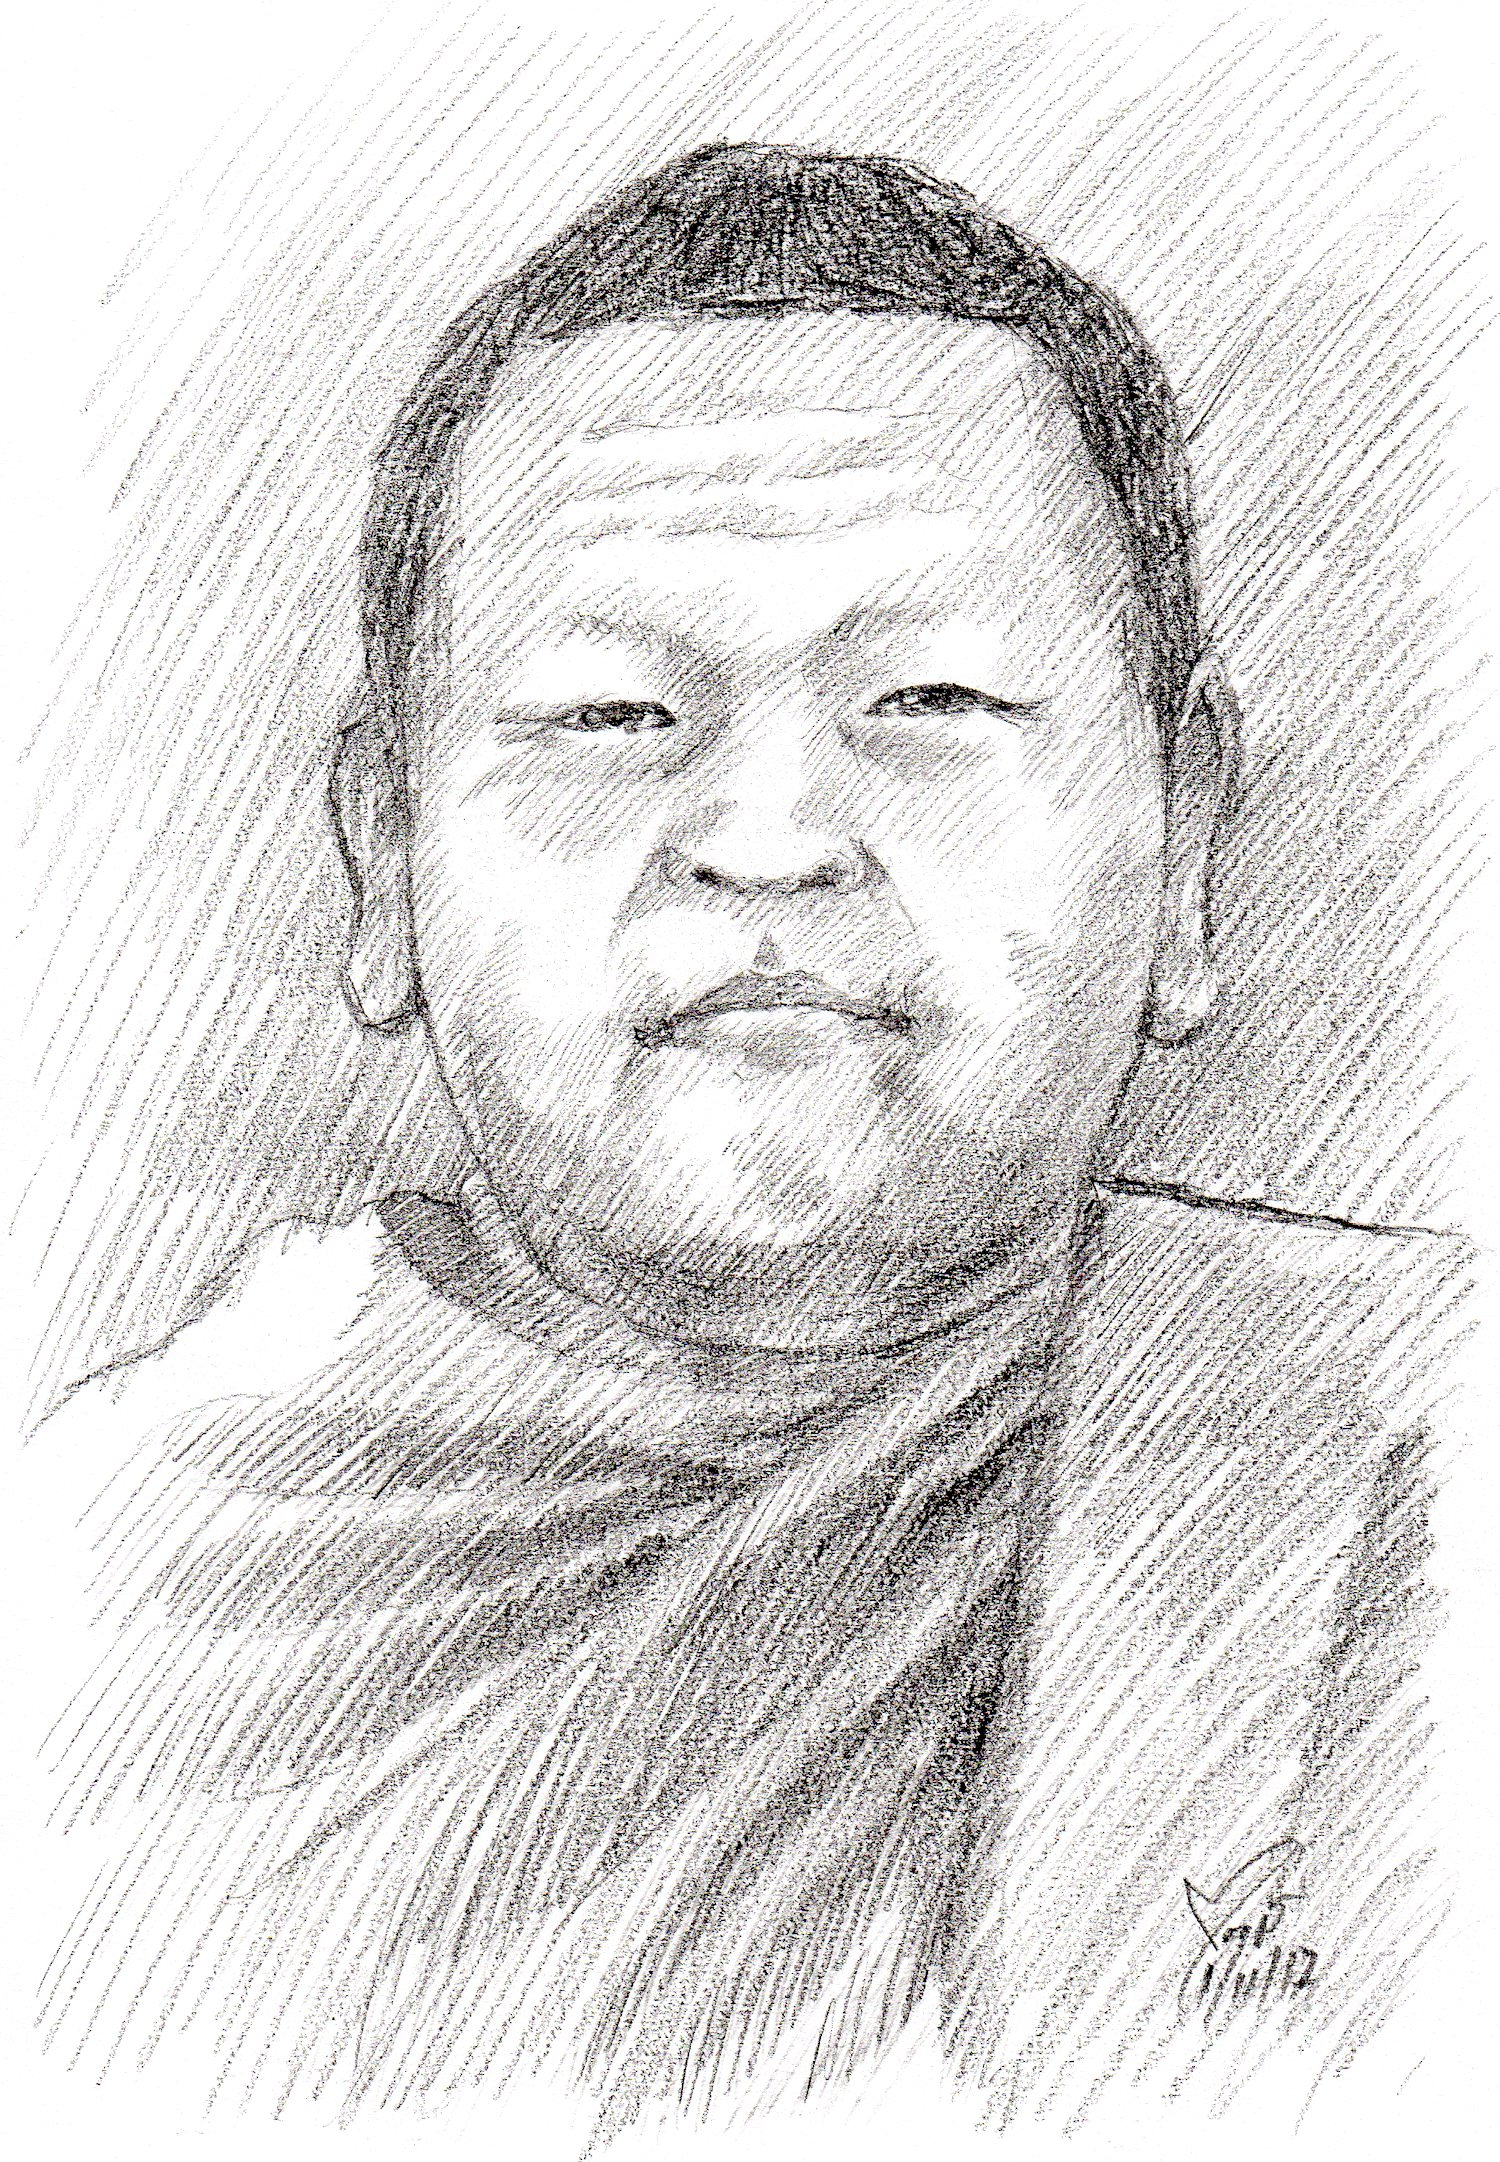 Drawing Portrait วาดภาพเหมือนพระภิกษุสงฆ์